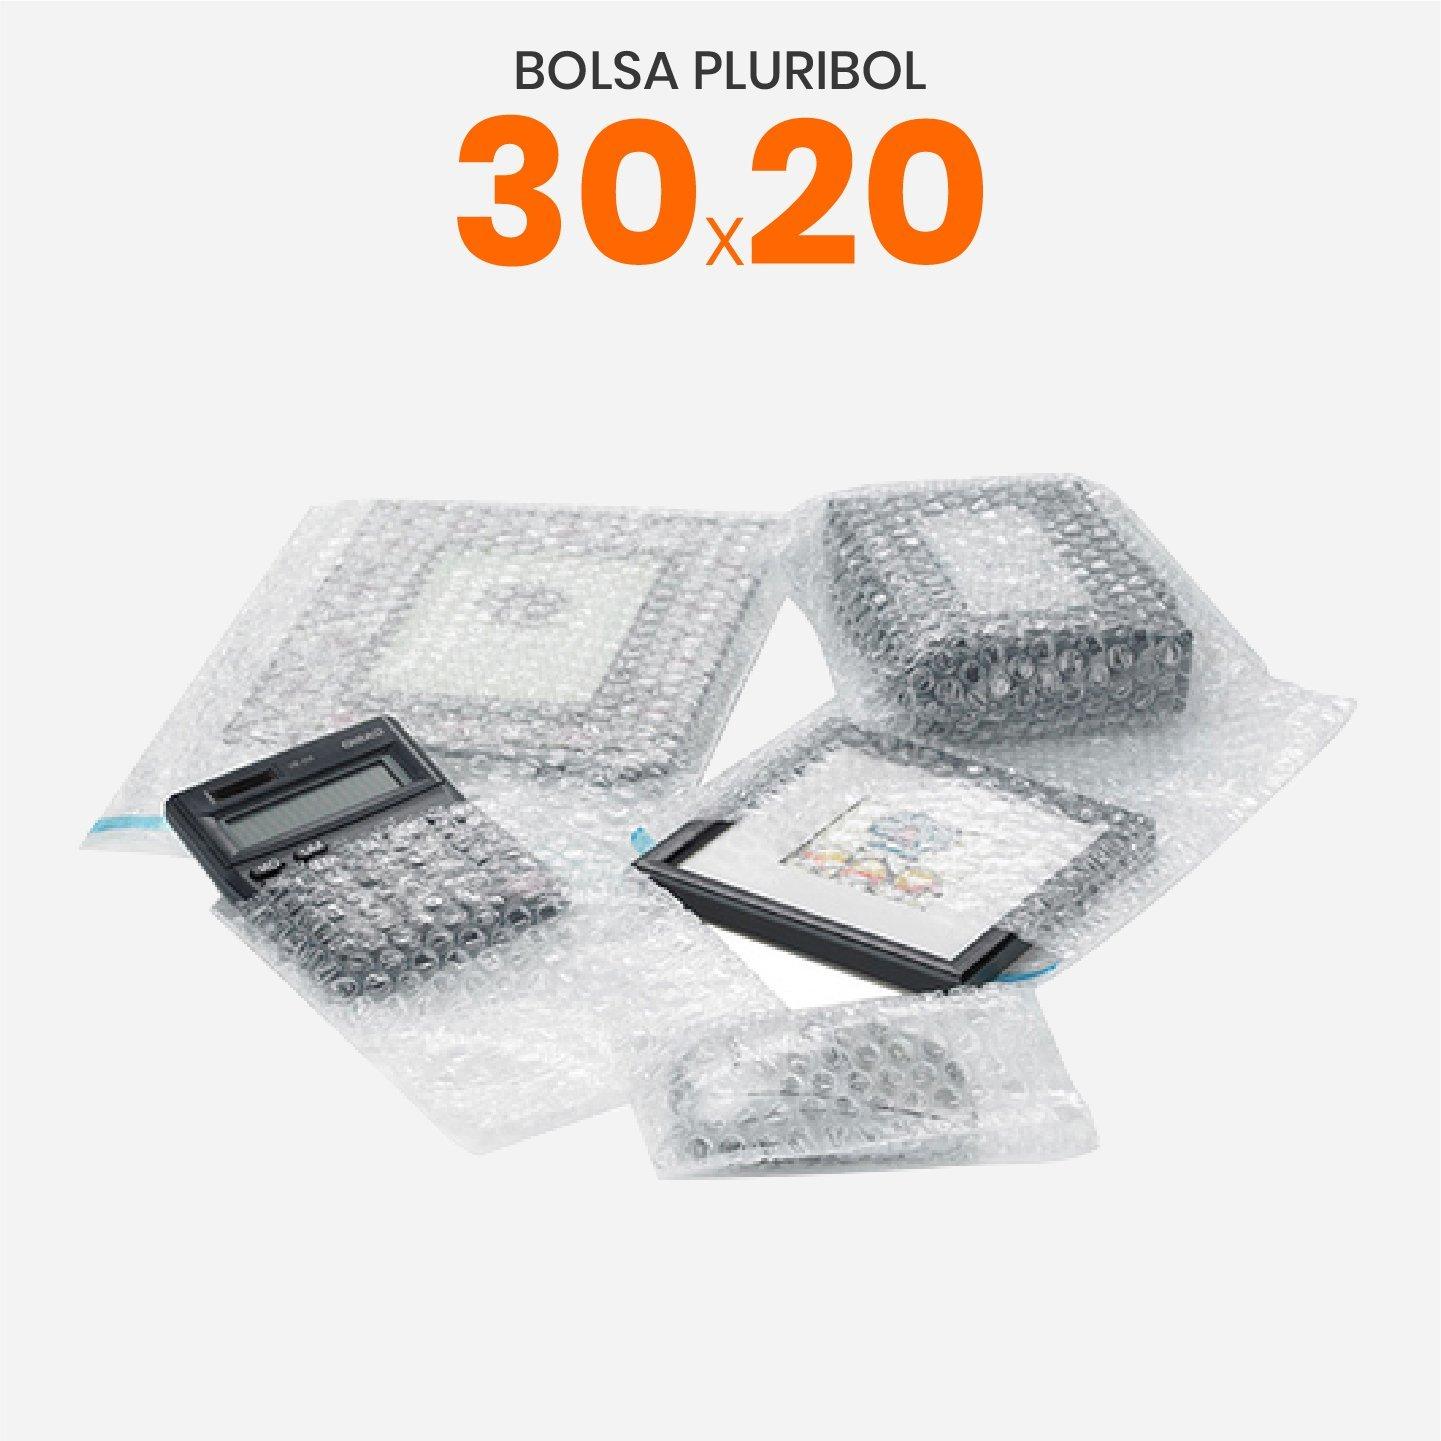 Bolsa pluribol polietileno 30X20